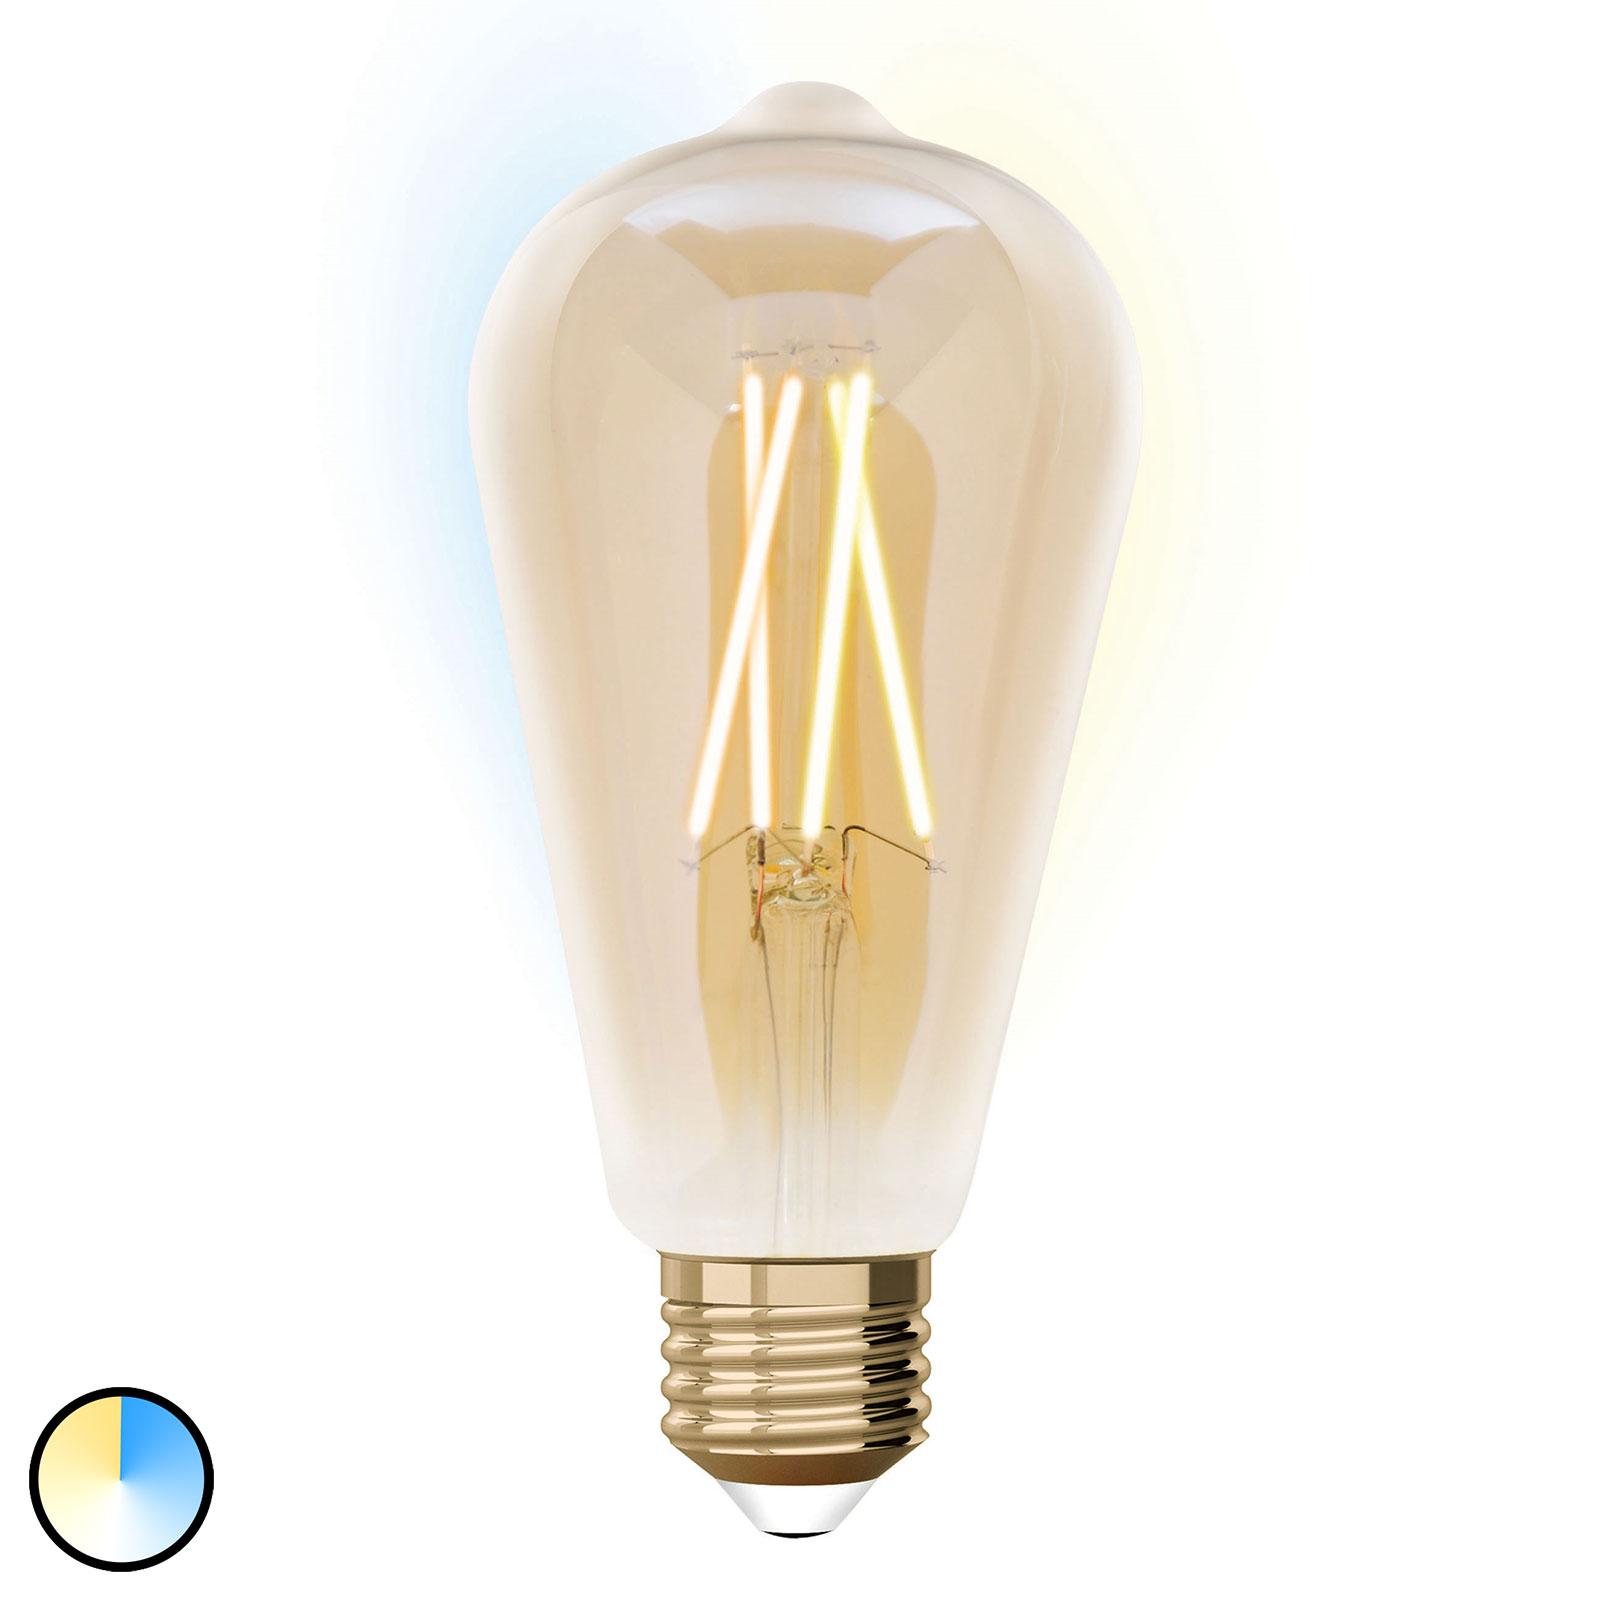 iDual LED-lampa E27 9 W ST64 utvidgning